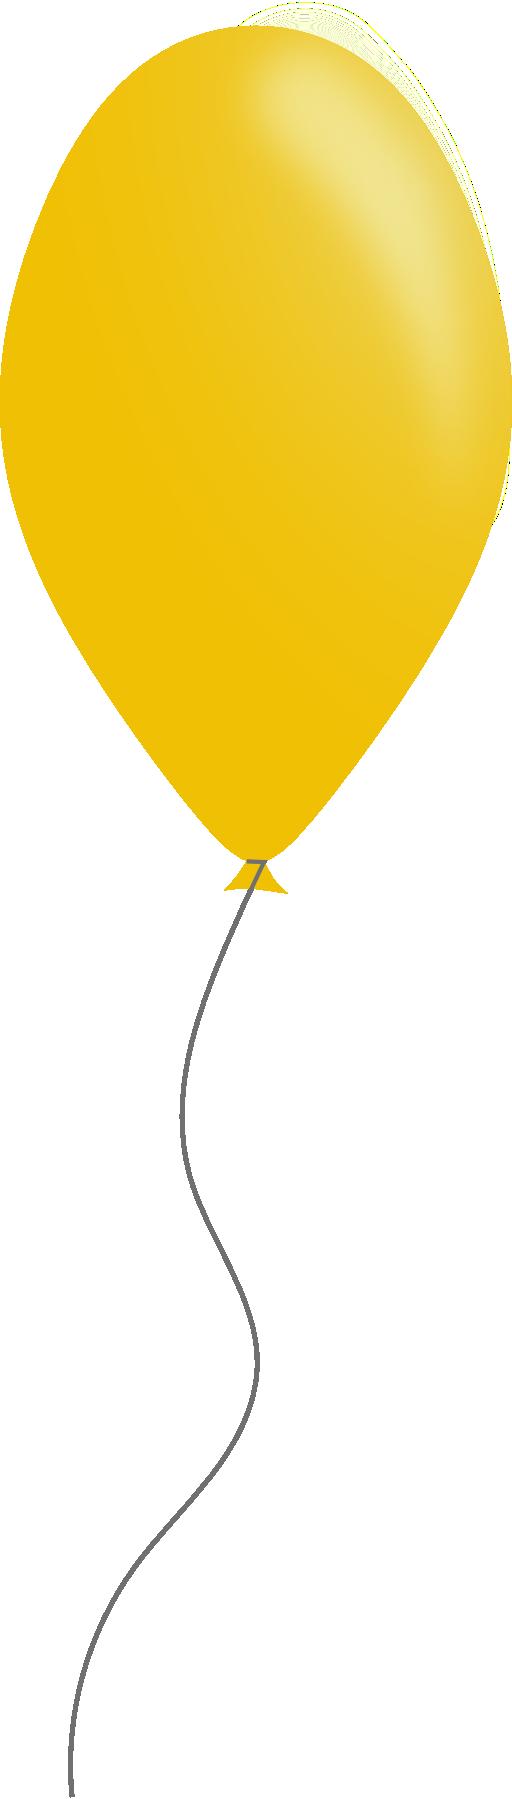 clipart yellow balloons - photo #19